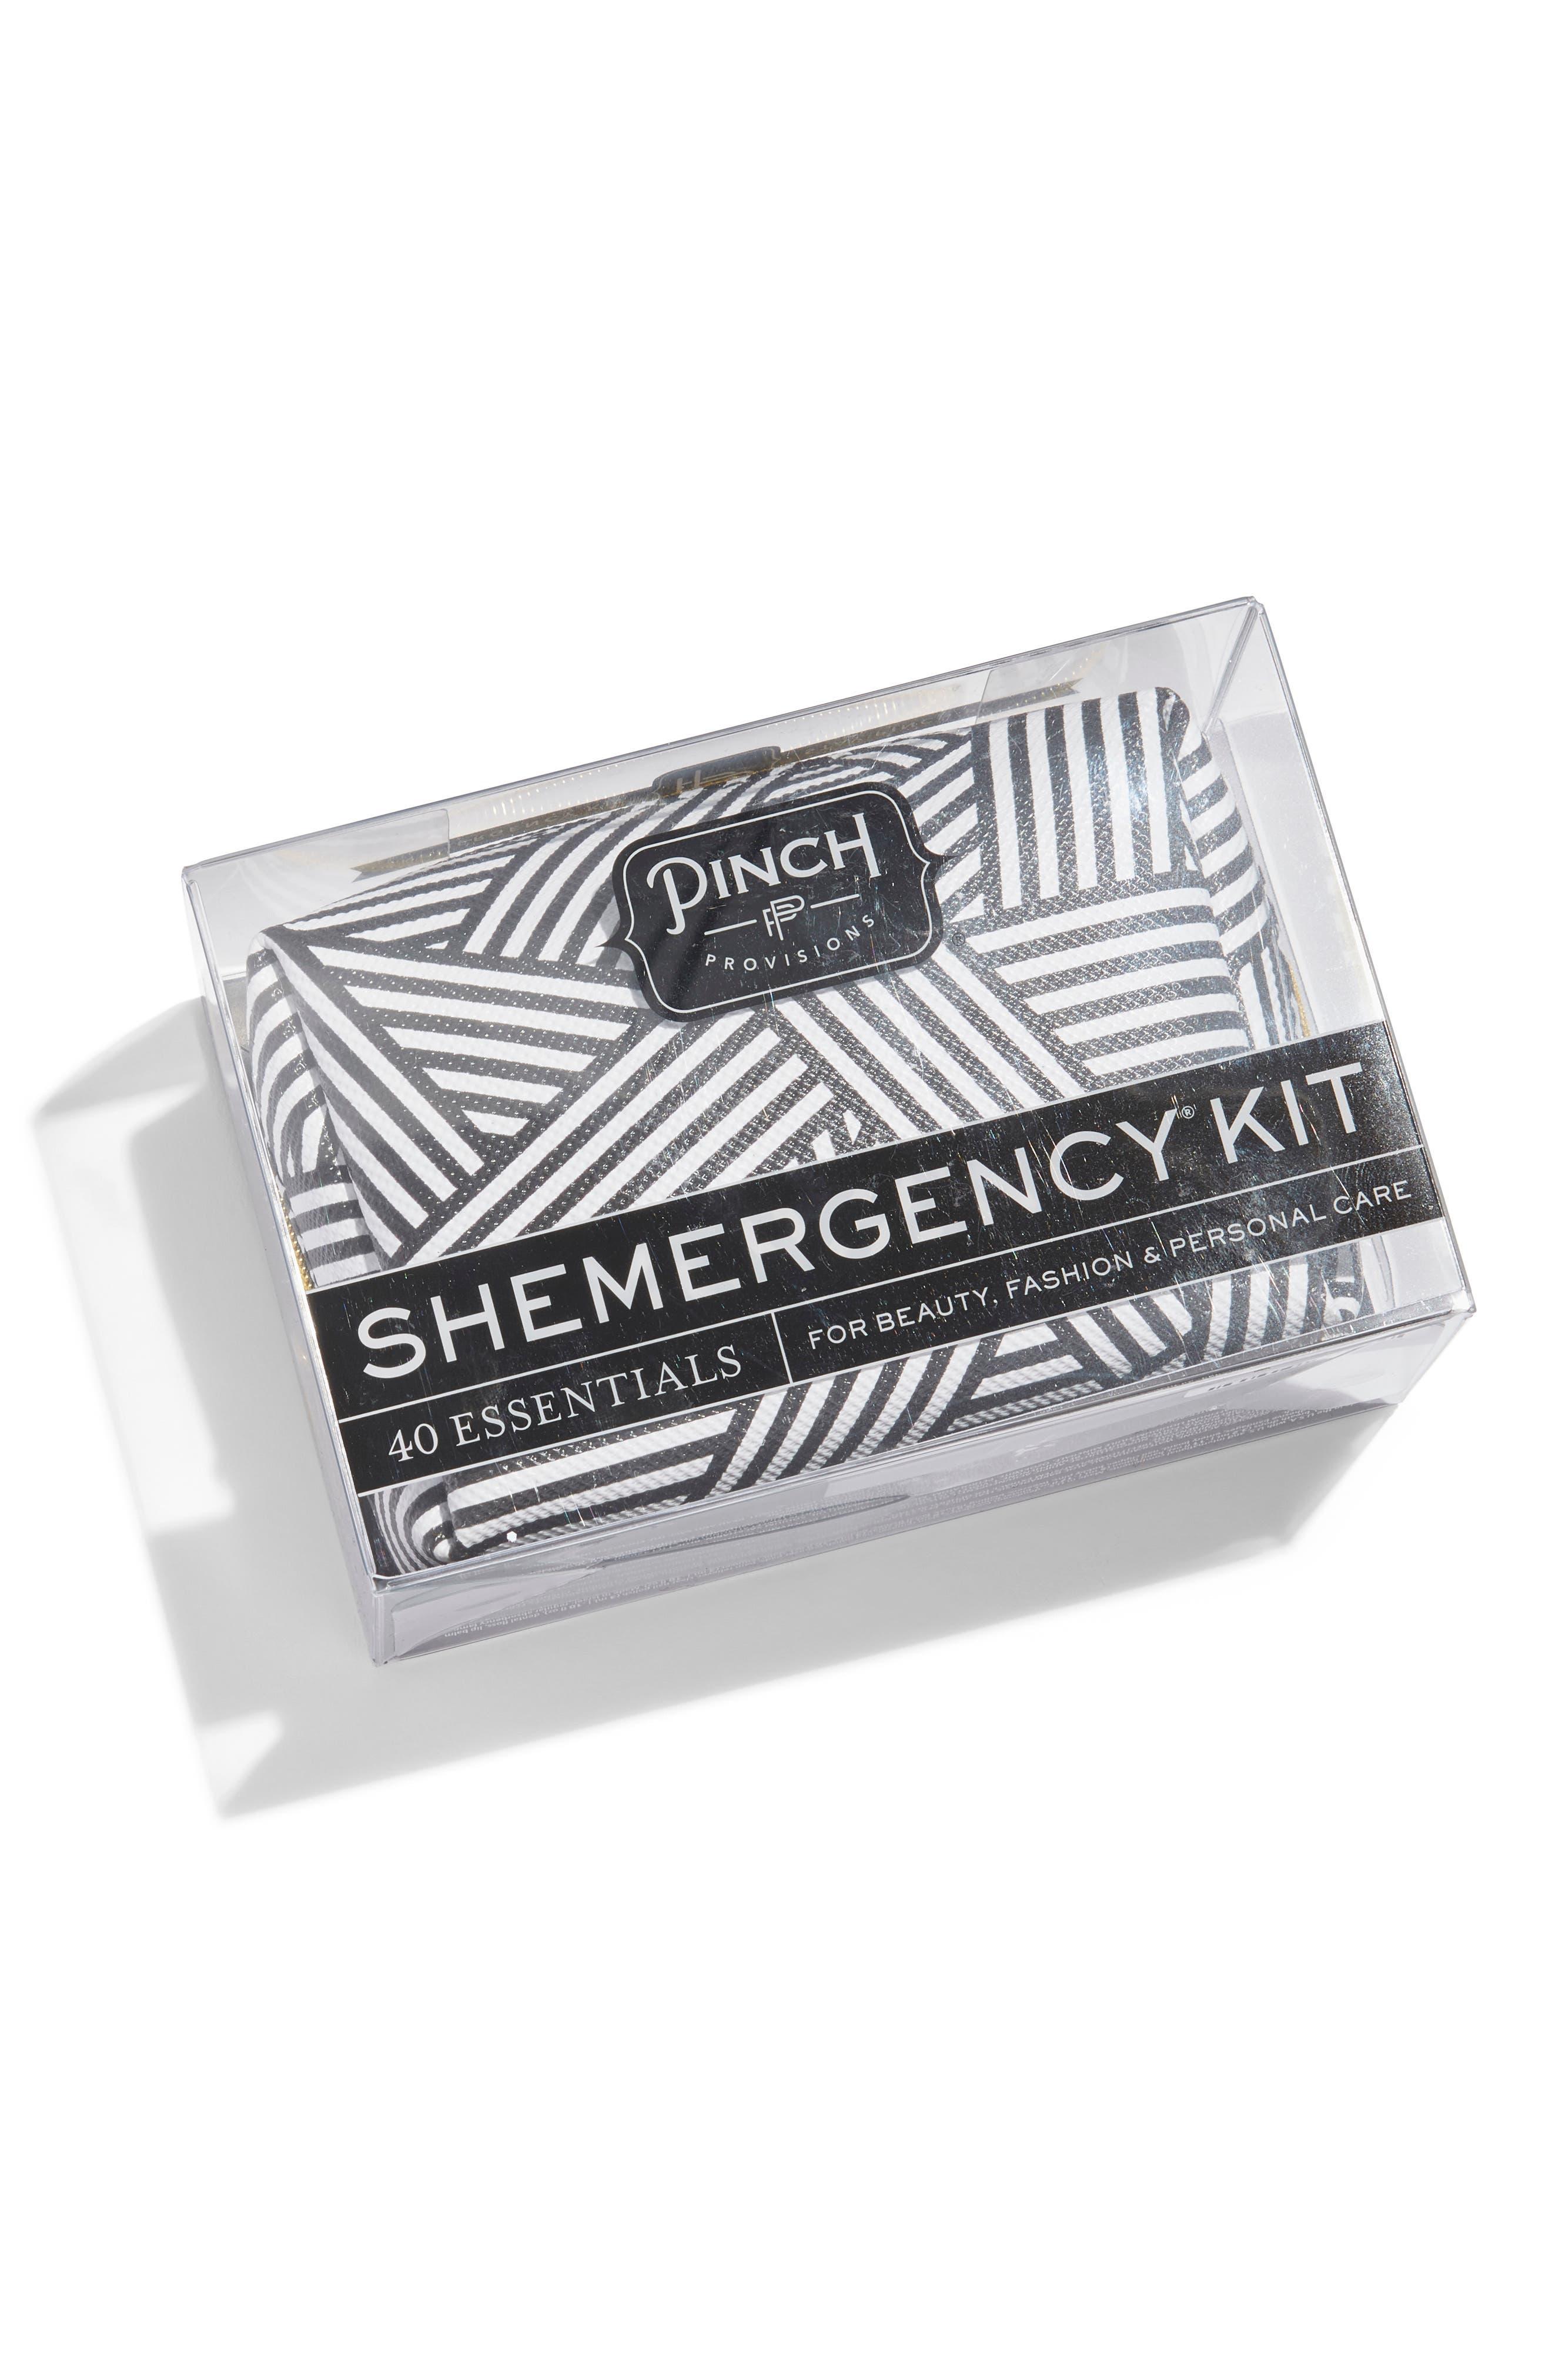 Shemergency Kit,                             Main thumbnail 1, color,                             001